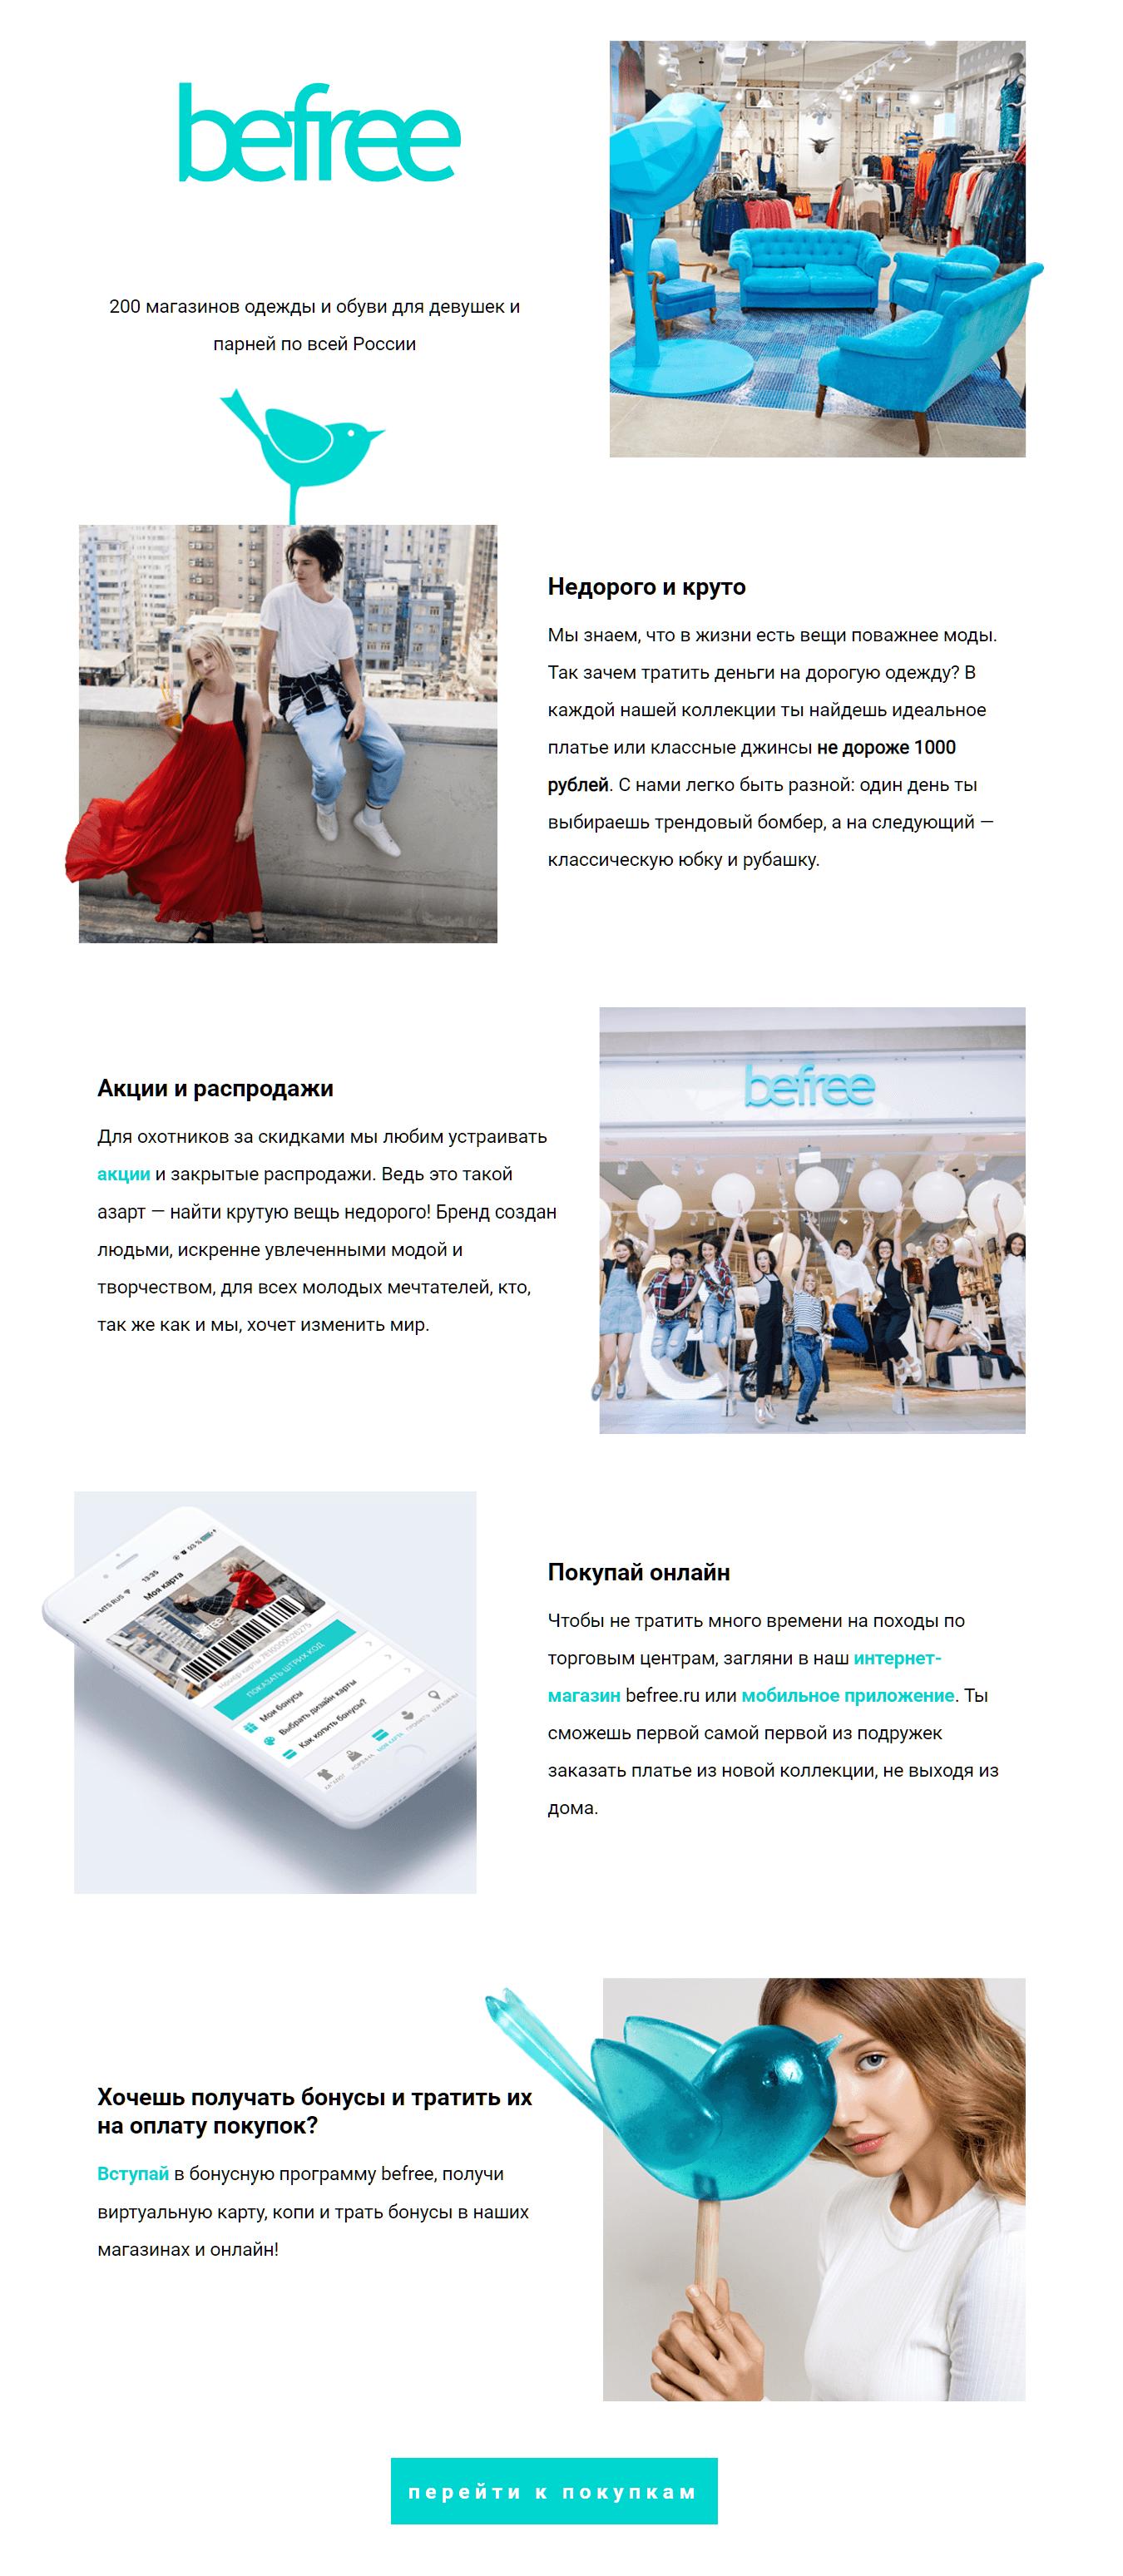 Текст для интернет-магазина